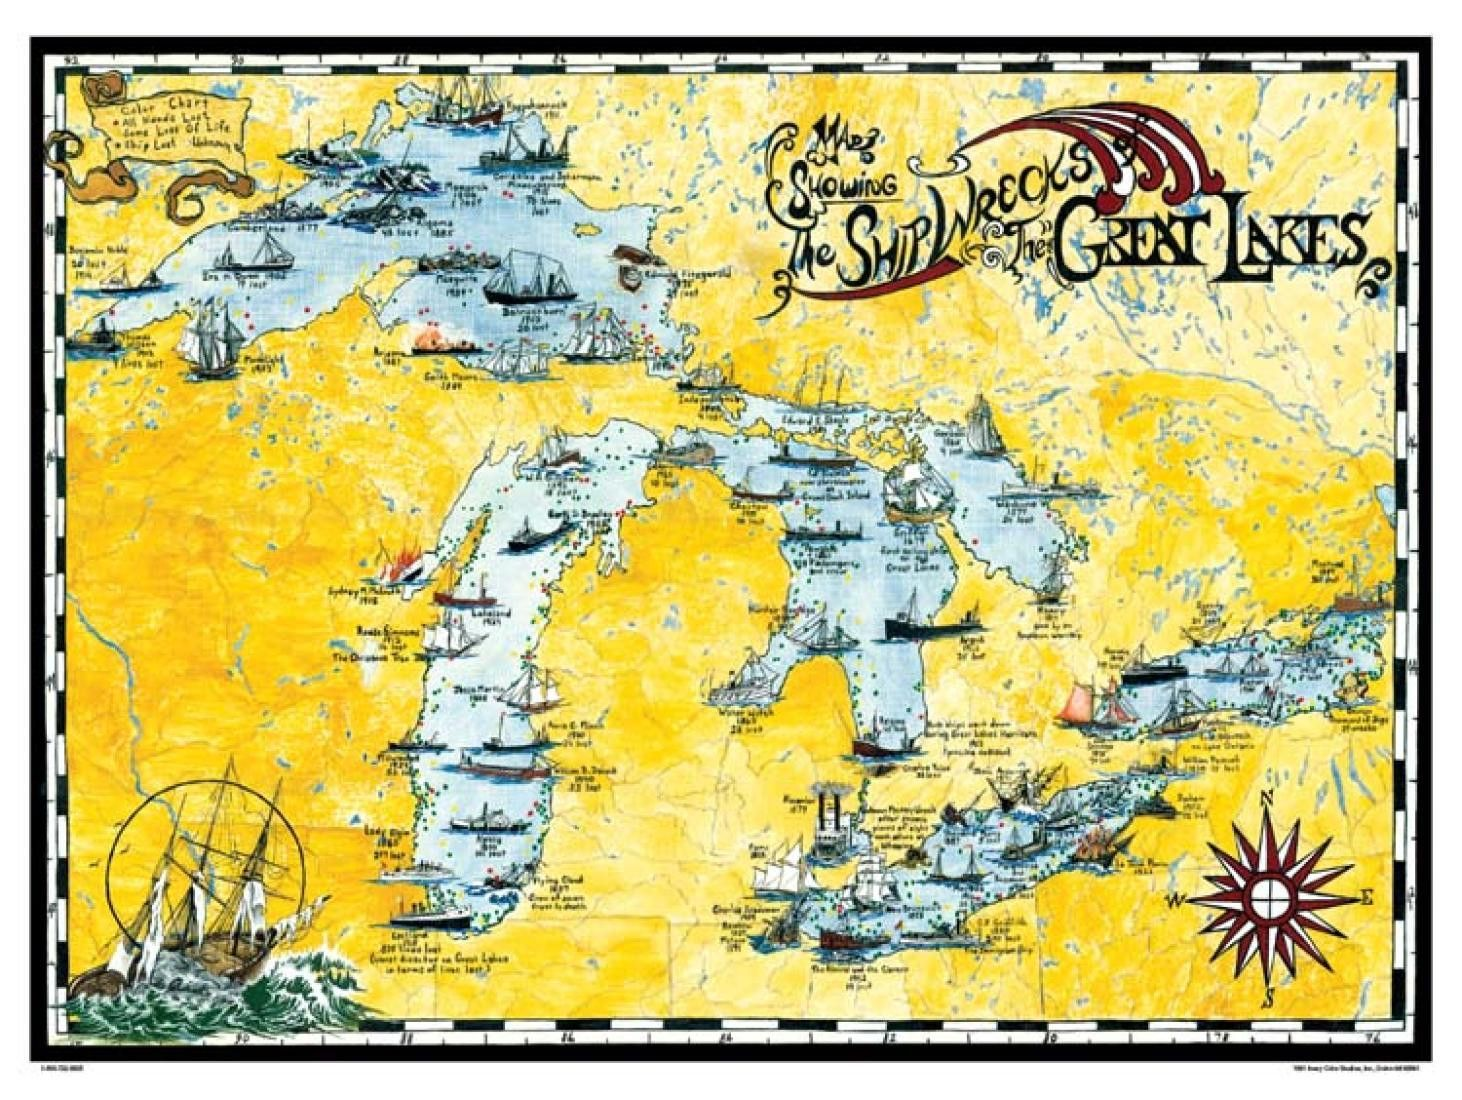 map of lake michigan shipwrecks Great Lakes Shipwreck Map By Avery Color Studios Great Lakes map of lake michigan shipwrecks